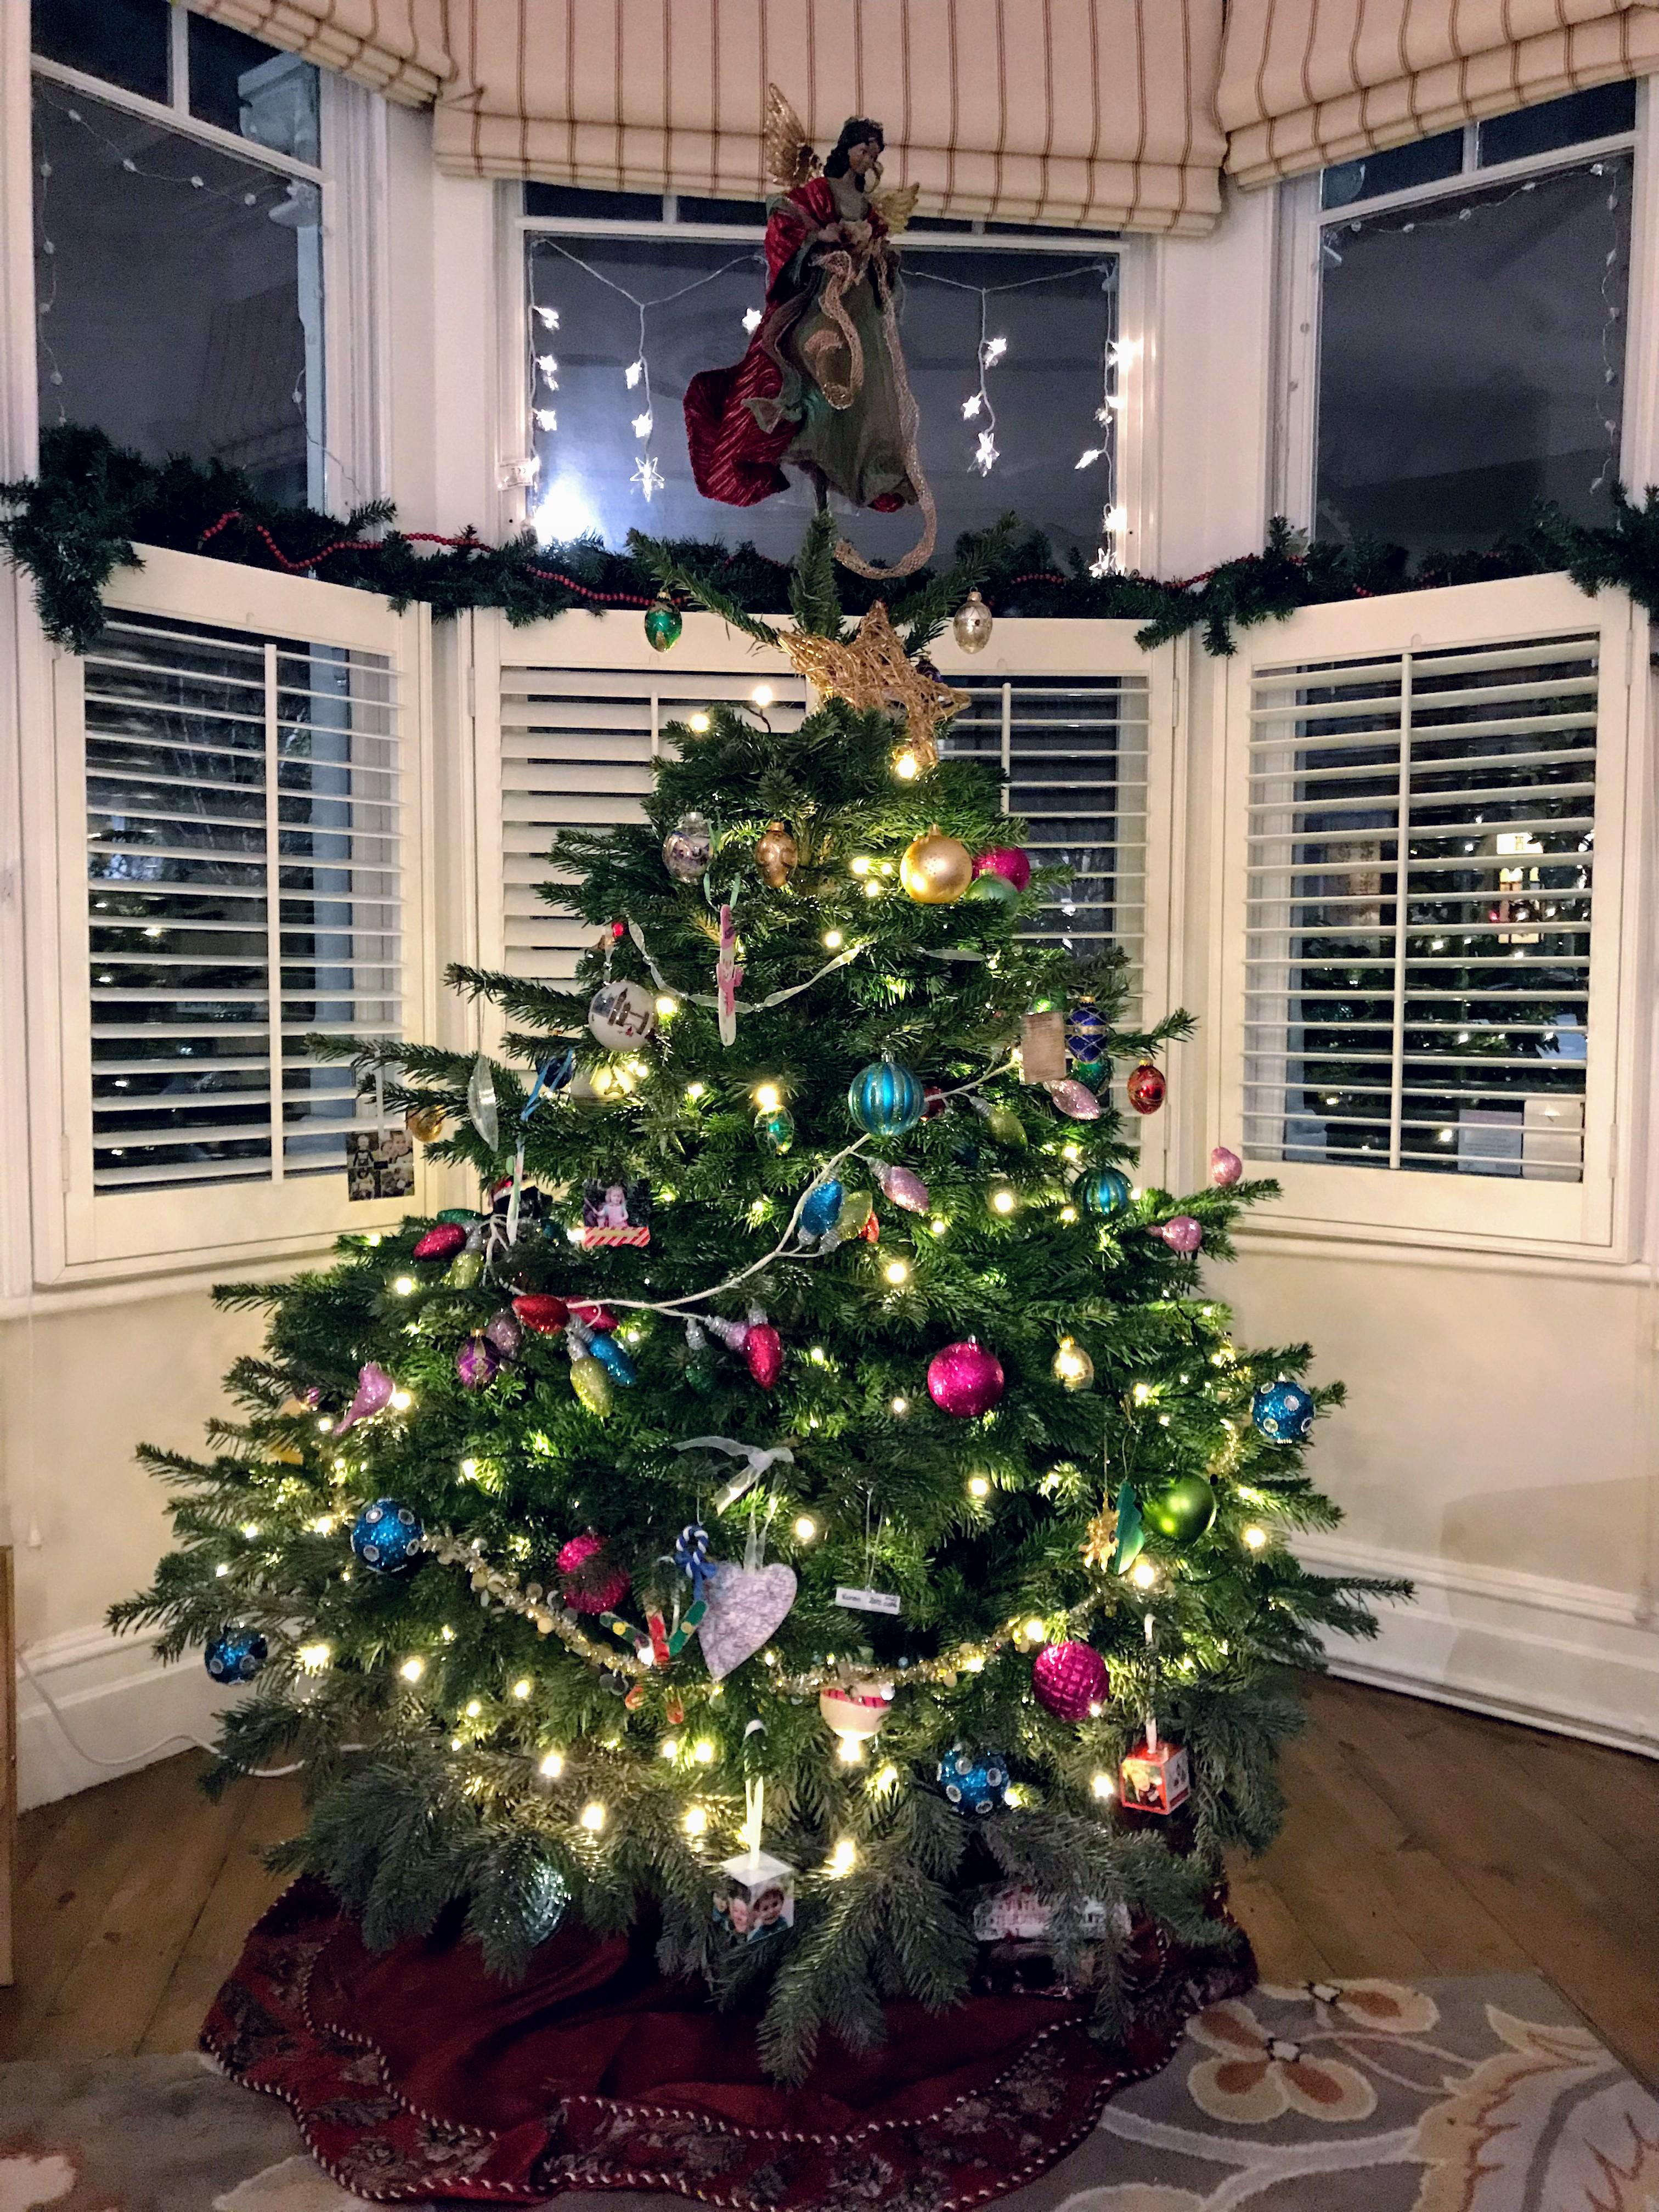 An American Christmas Tree Story – Mischief and Mayhem